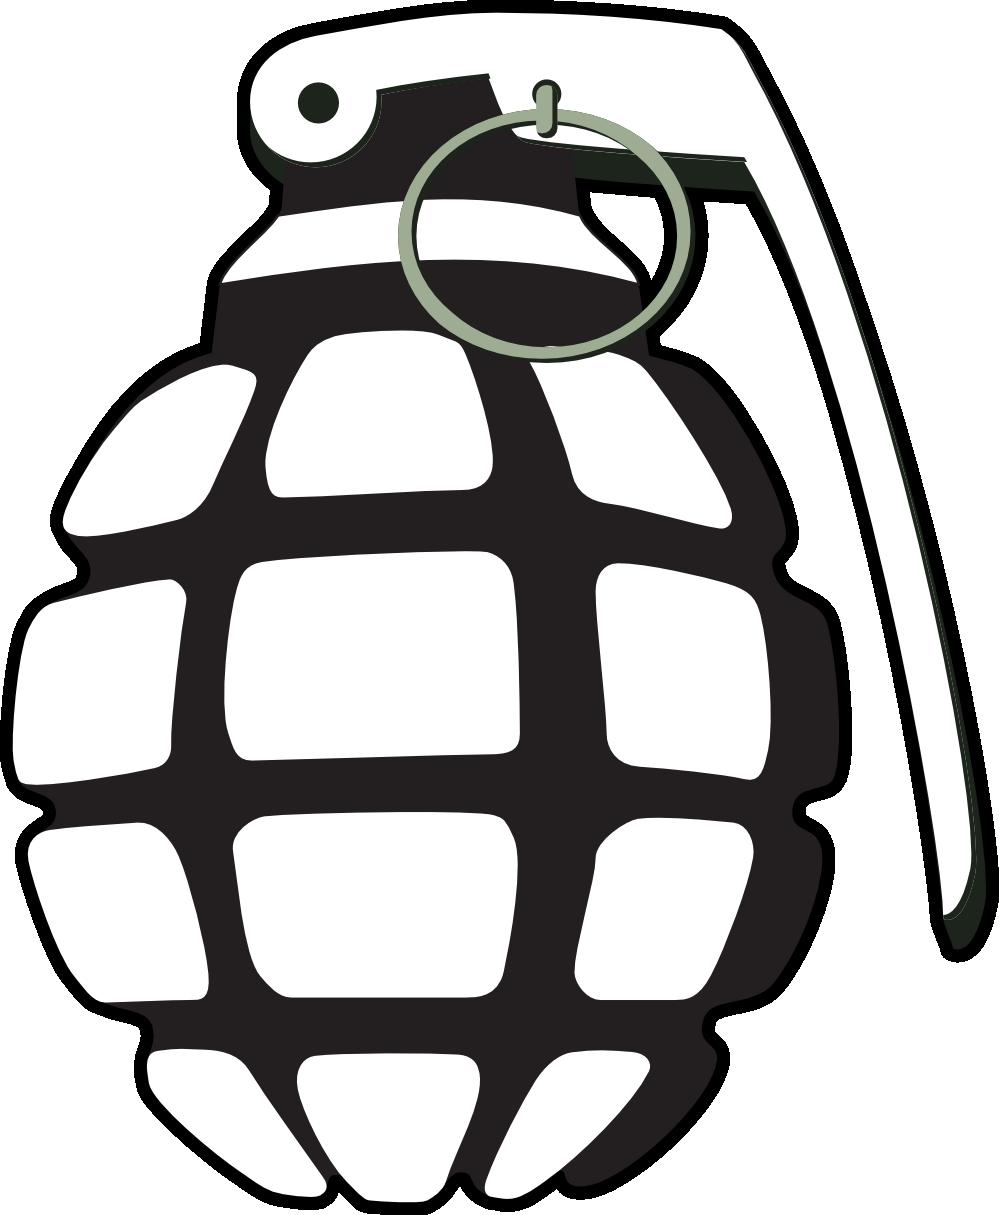 Website clipart black and white. Grenade clip art